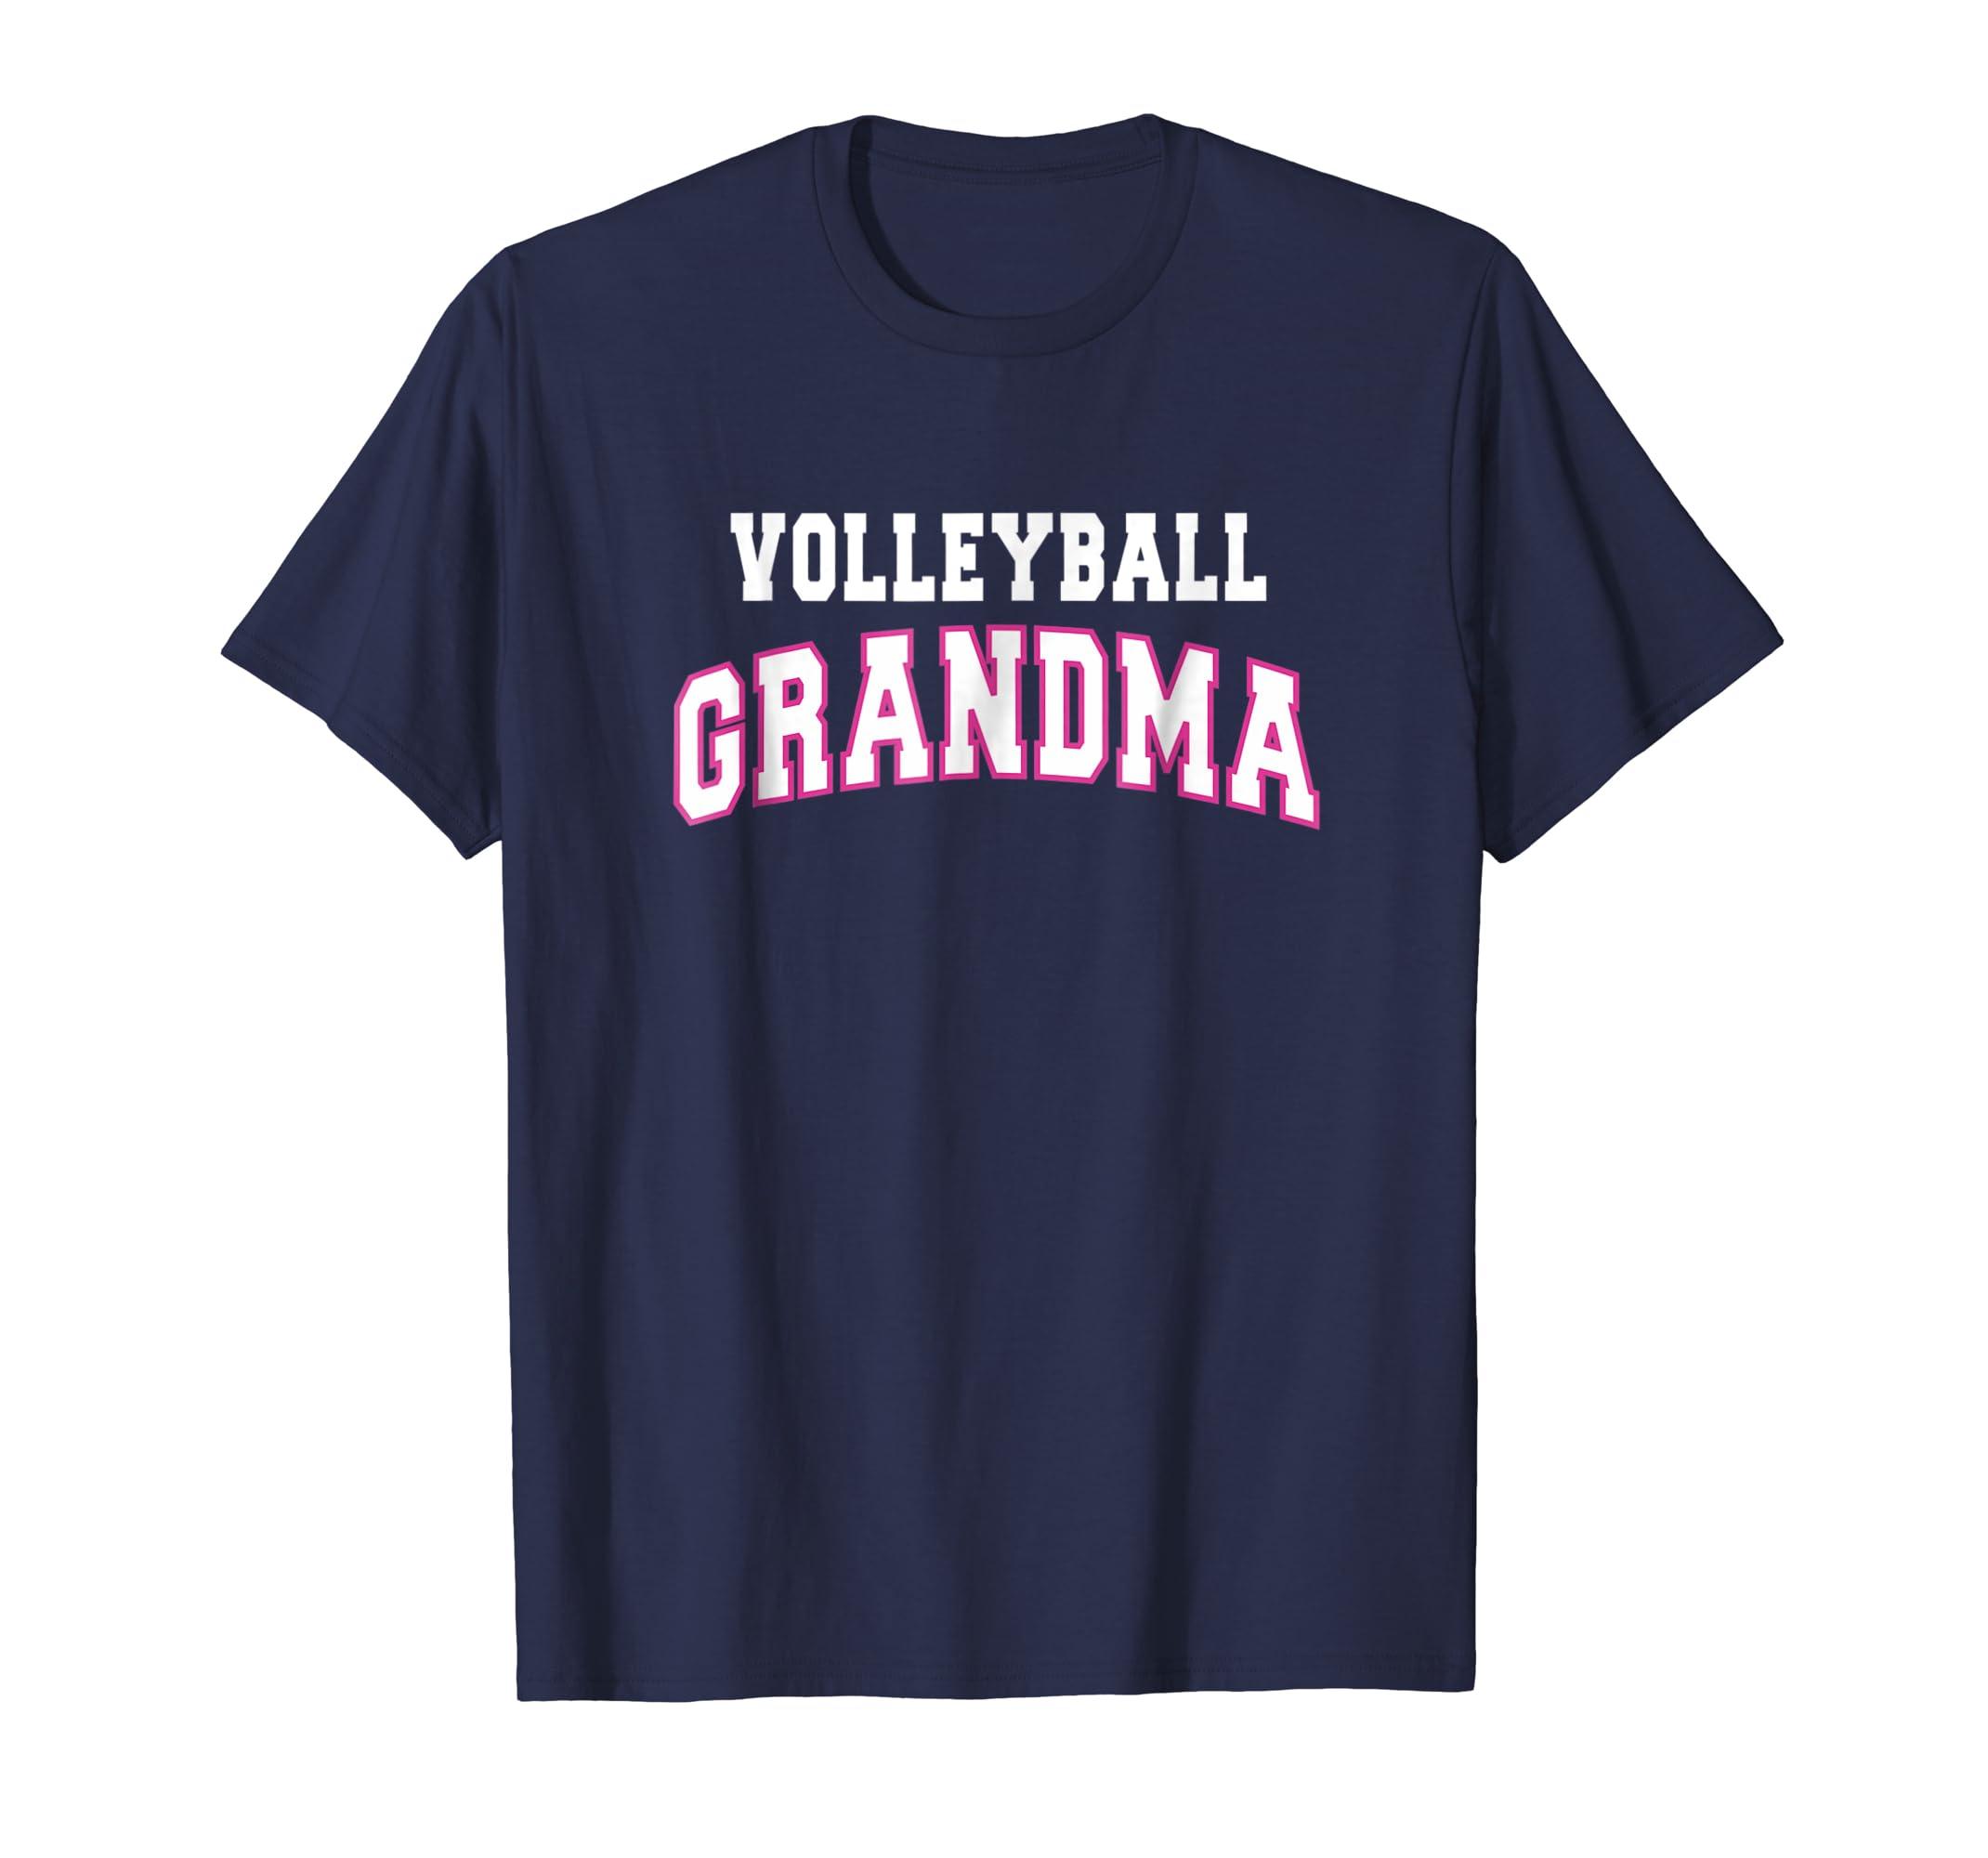 Volleyball Grandma Mothers Day Gift Idea T shirt Women-ln